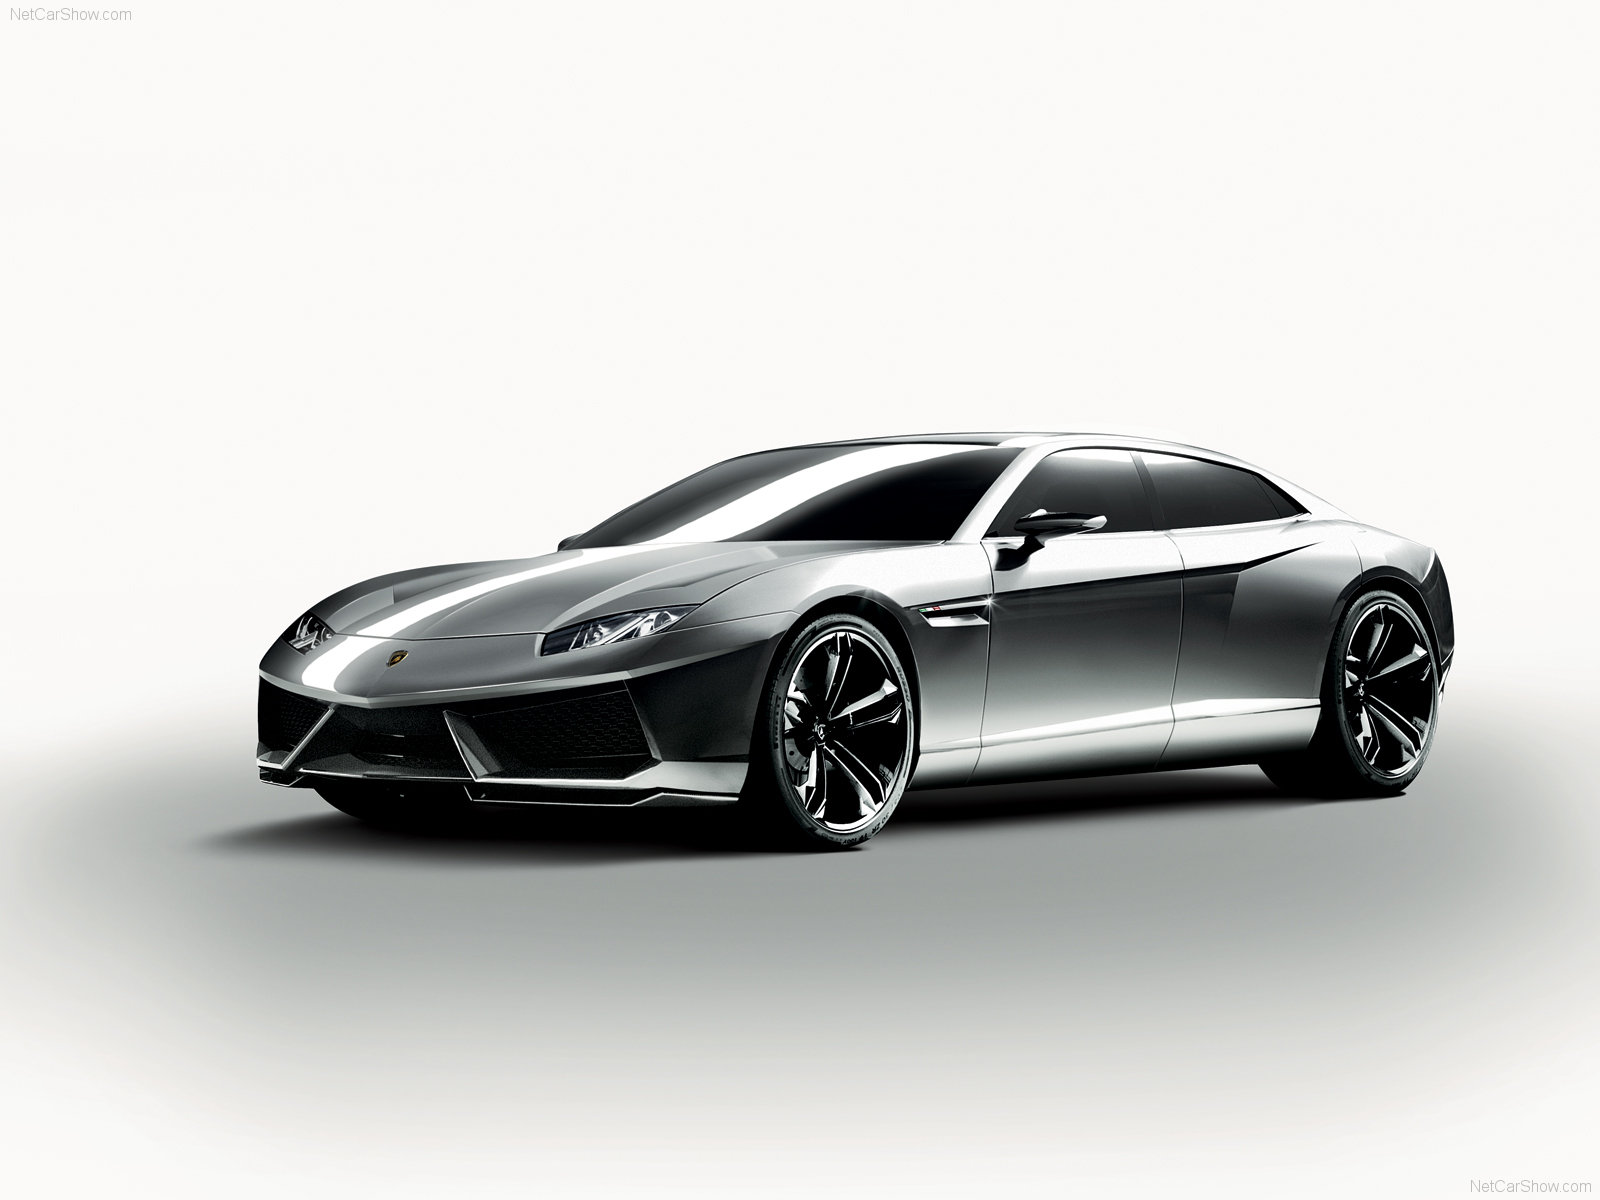 HQ Lamborghini Estoque Concept 2008 02 Wallpaper   HQ 1600x1200